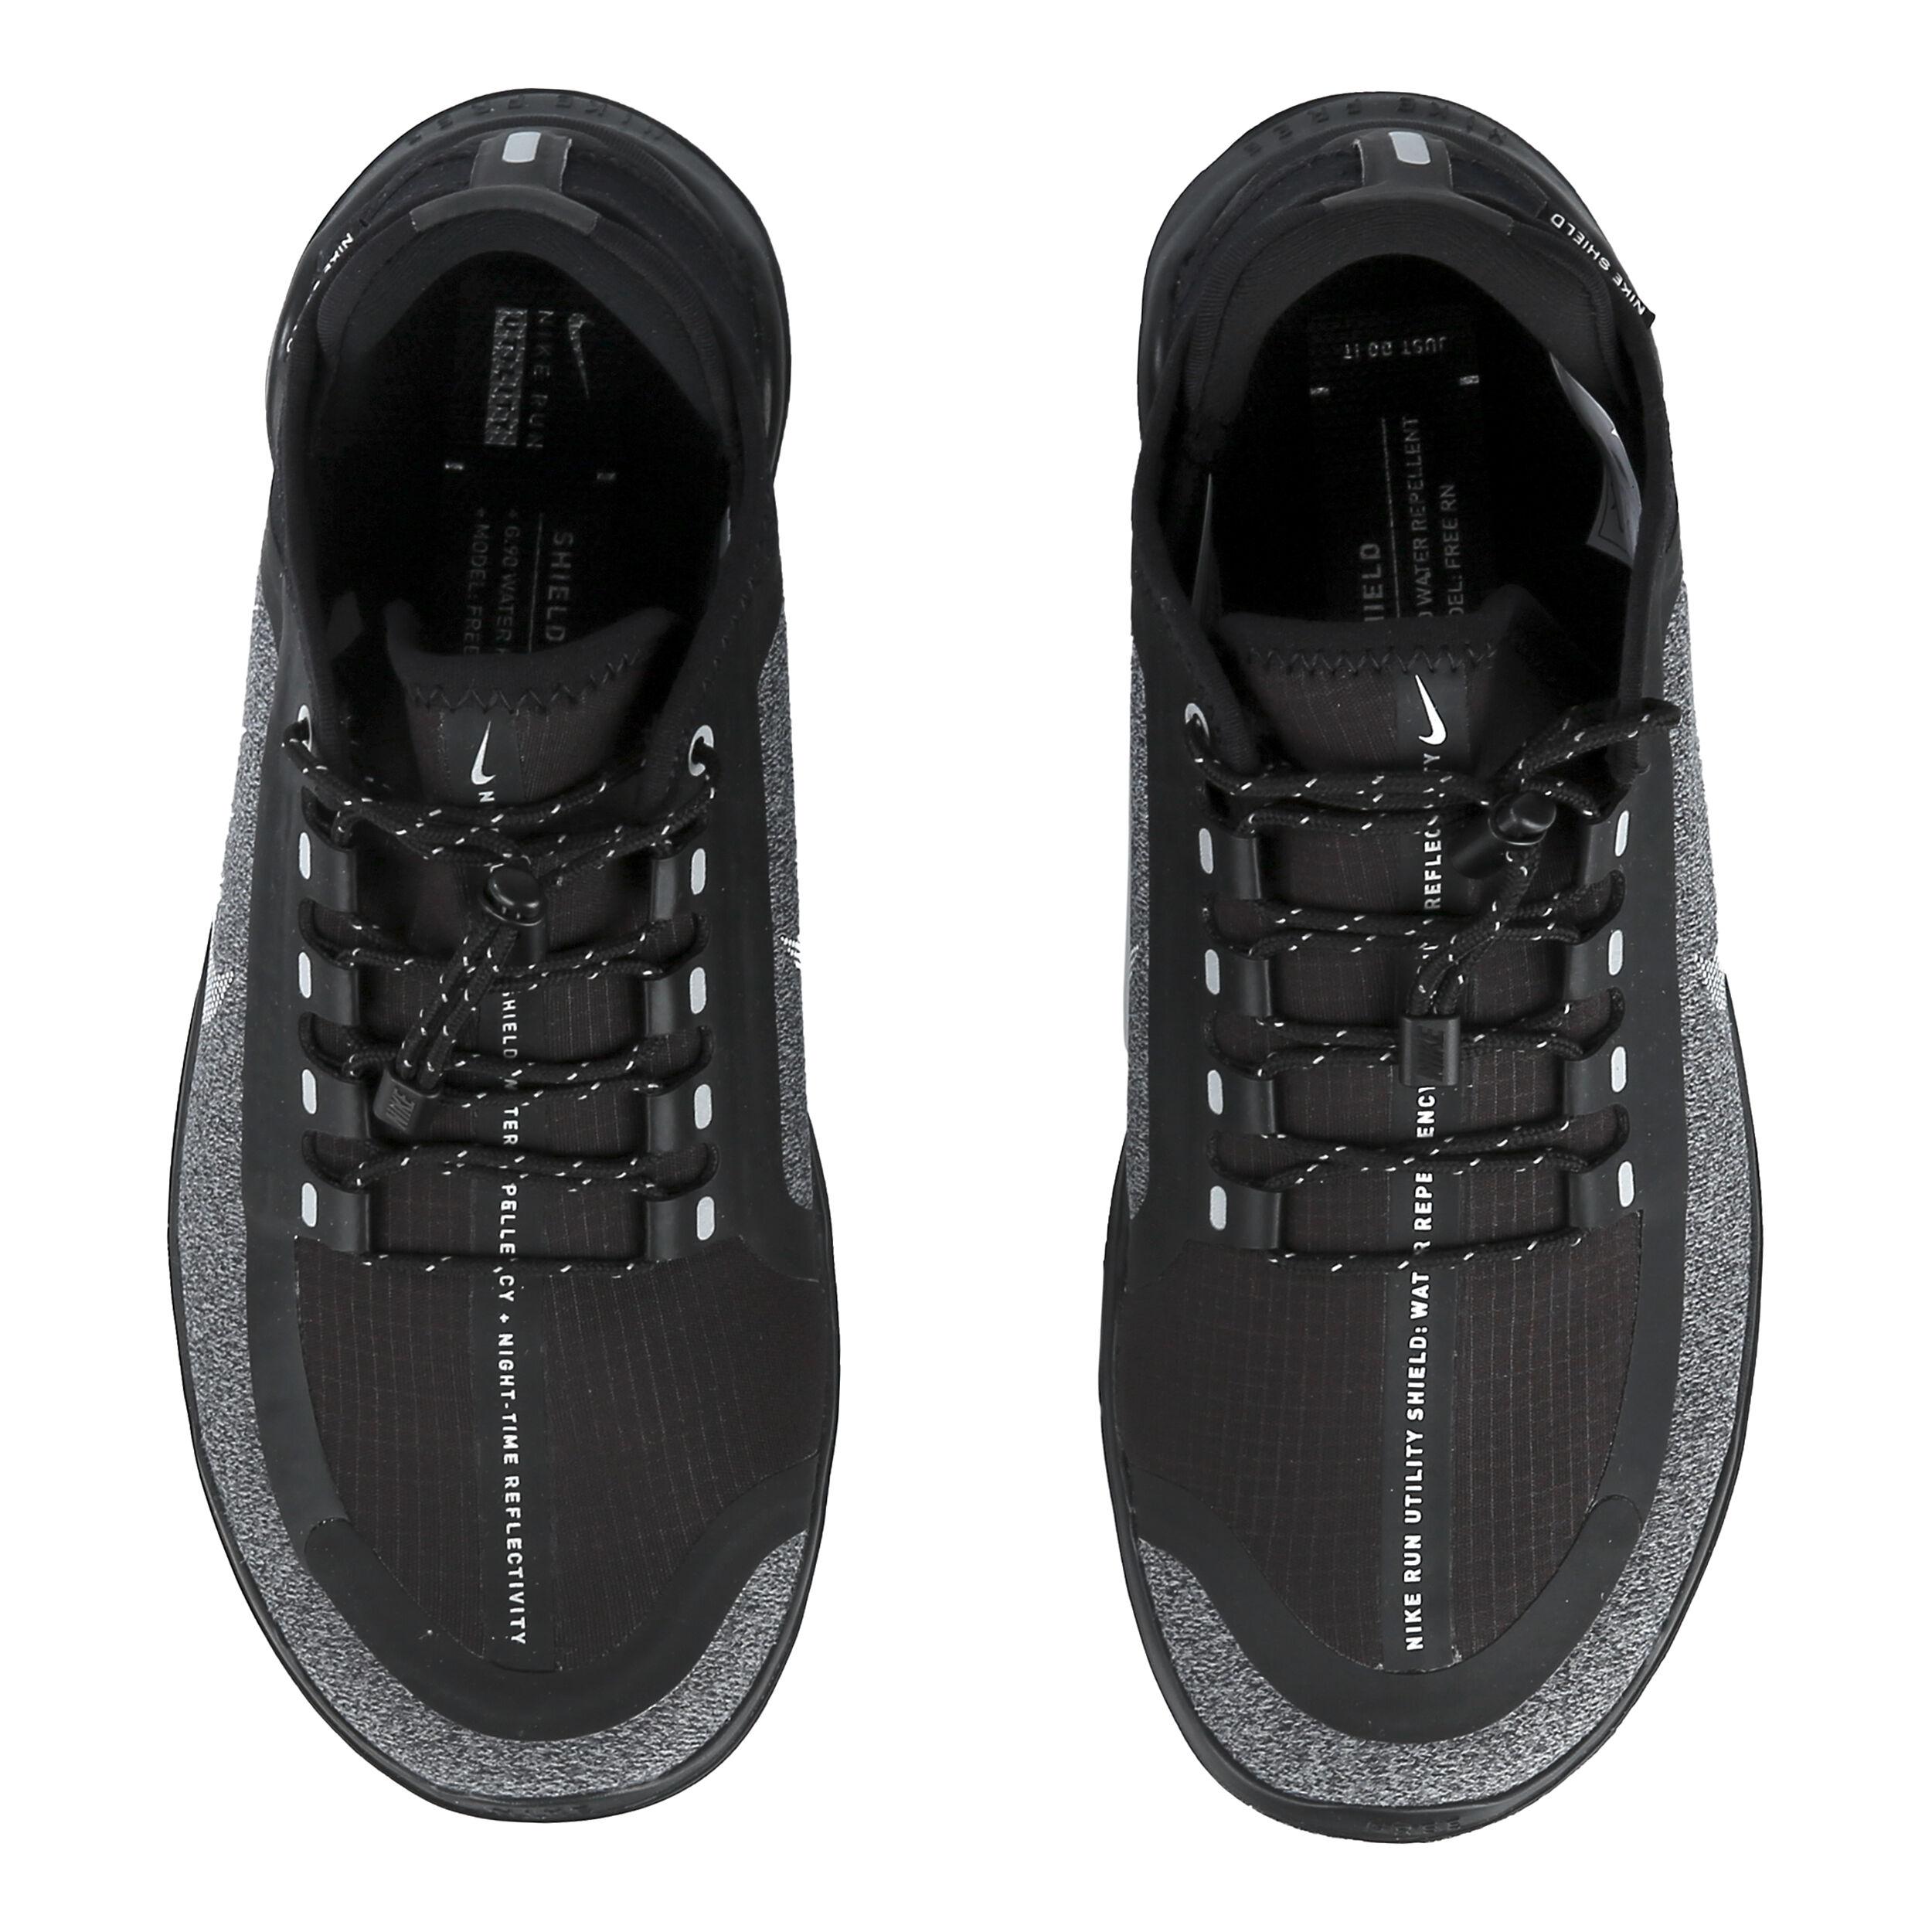 Nike Free RN 2018 Shield Water Repellent Schuhe, Nike